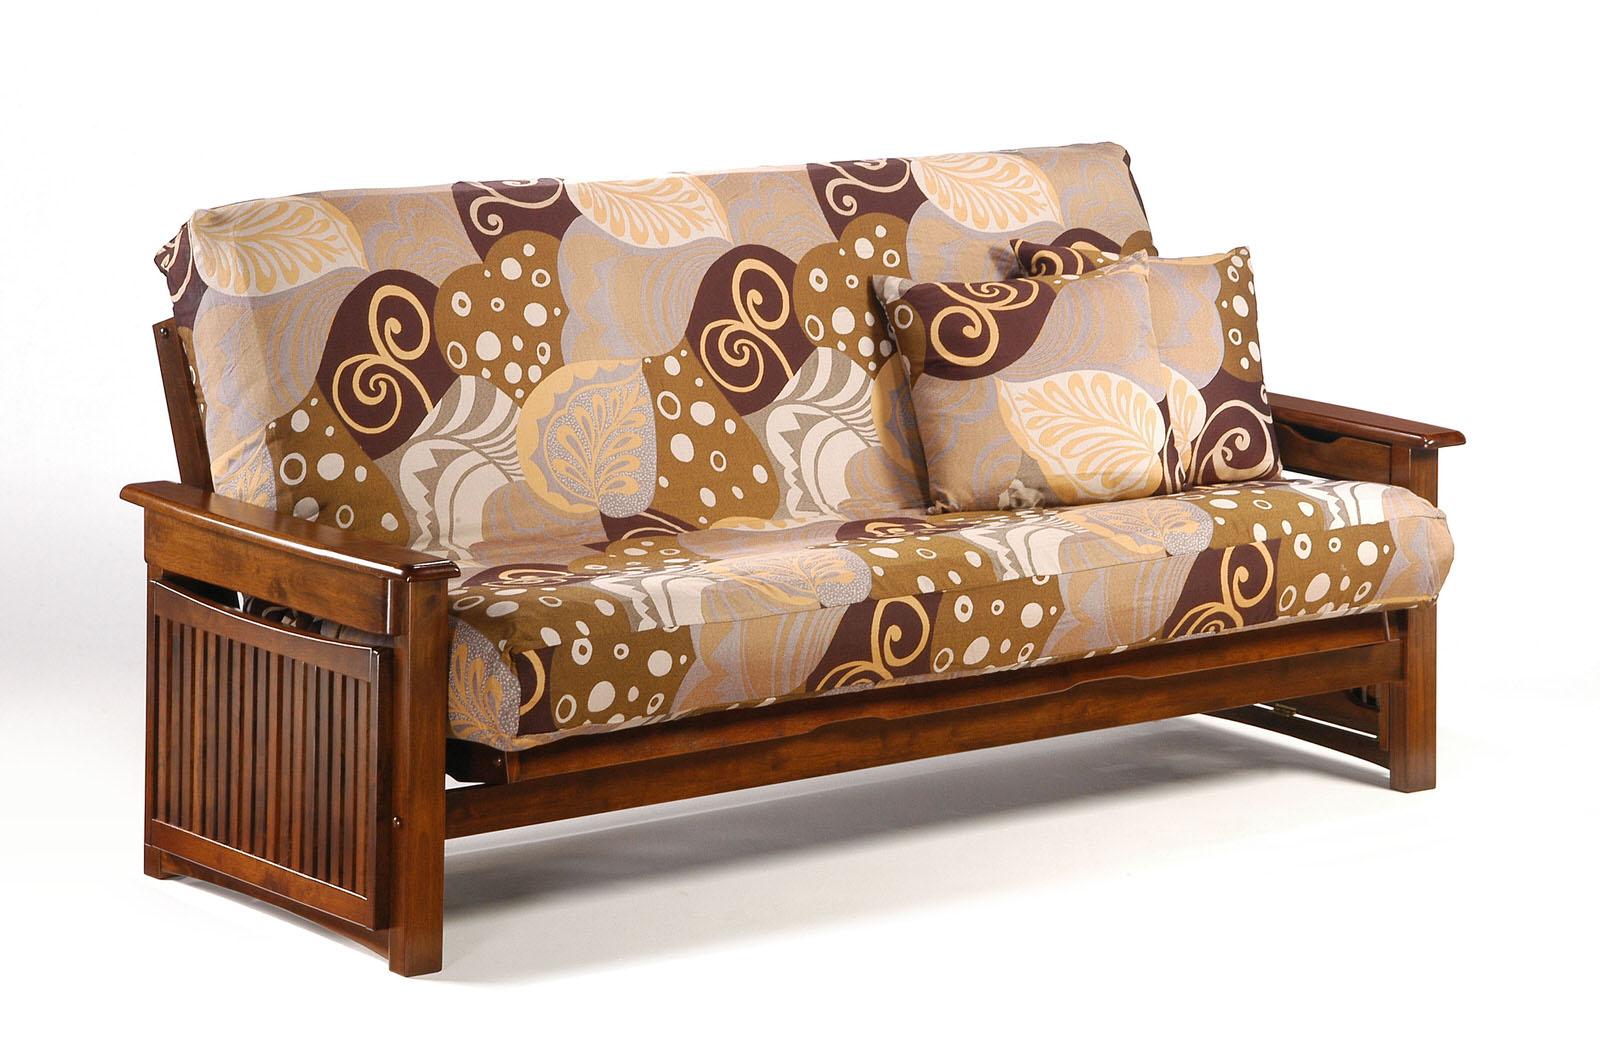 Raindrop Premium Futon Frame by Night&Day Furniture